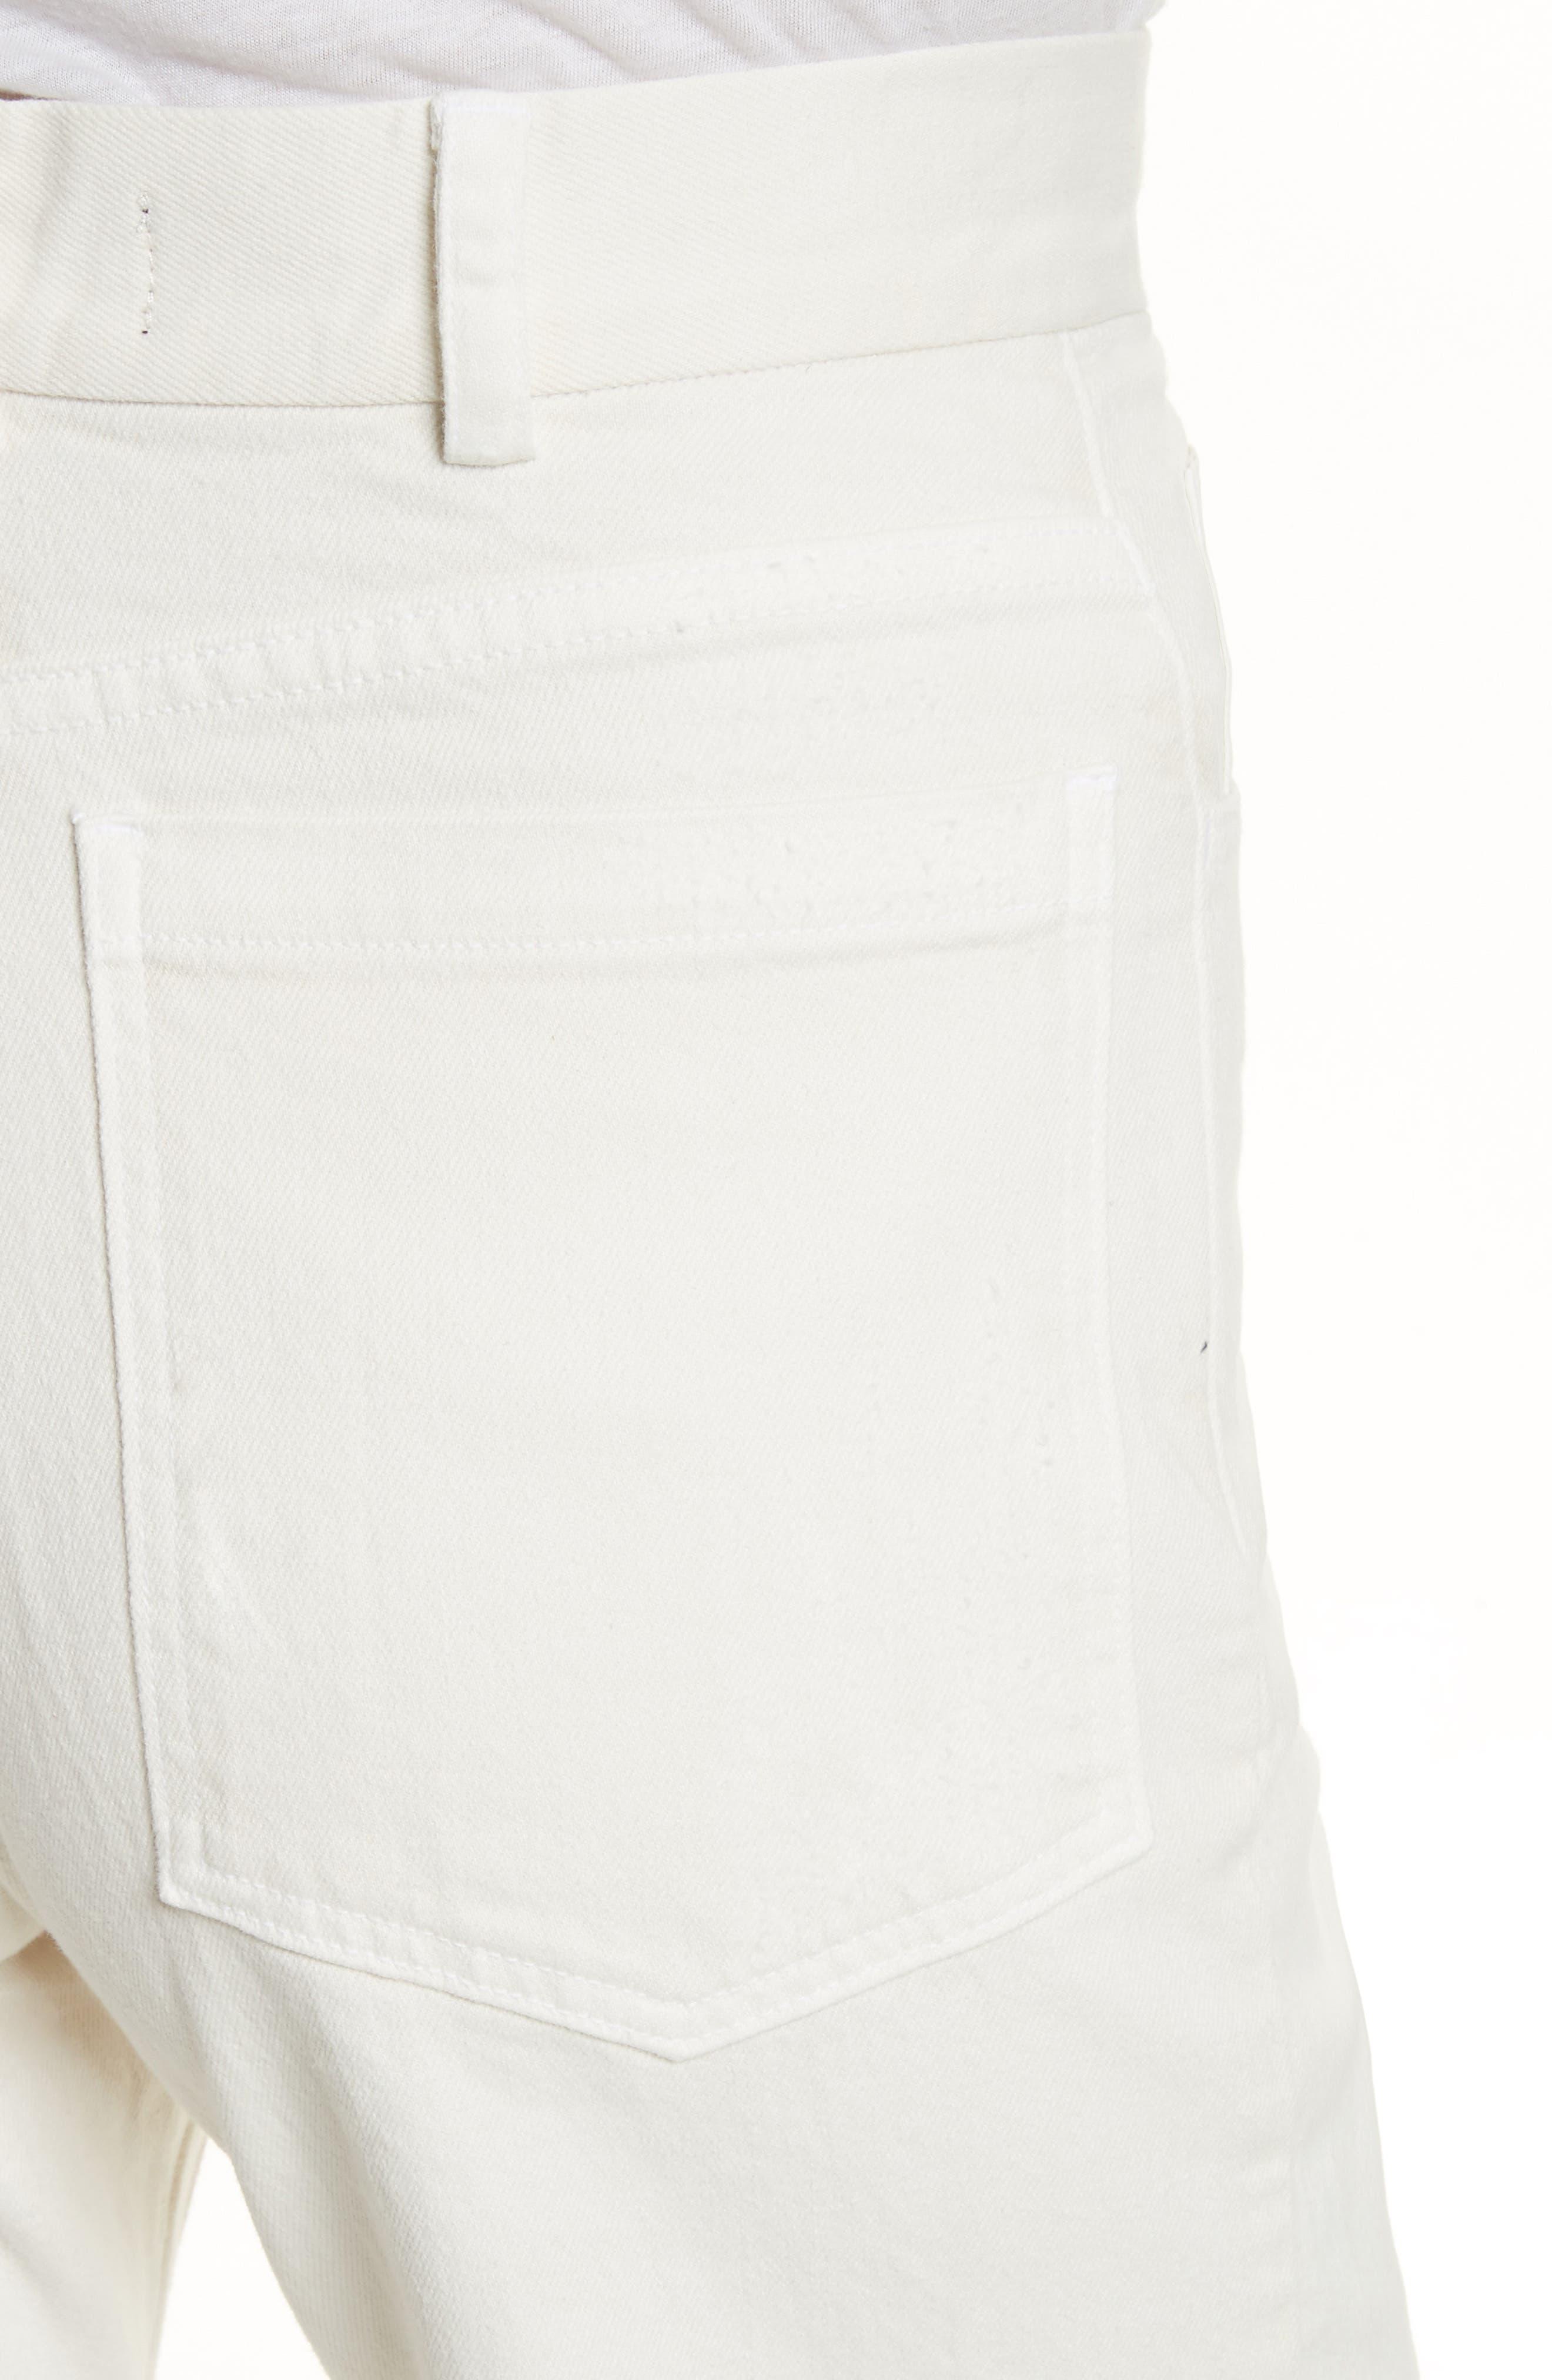 Rachey Comey Legion Crop Wide Leg Pants,                             Alternate thumbnail 4, color,                             DIRTY WHITE